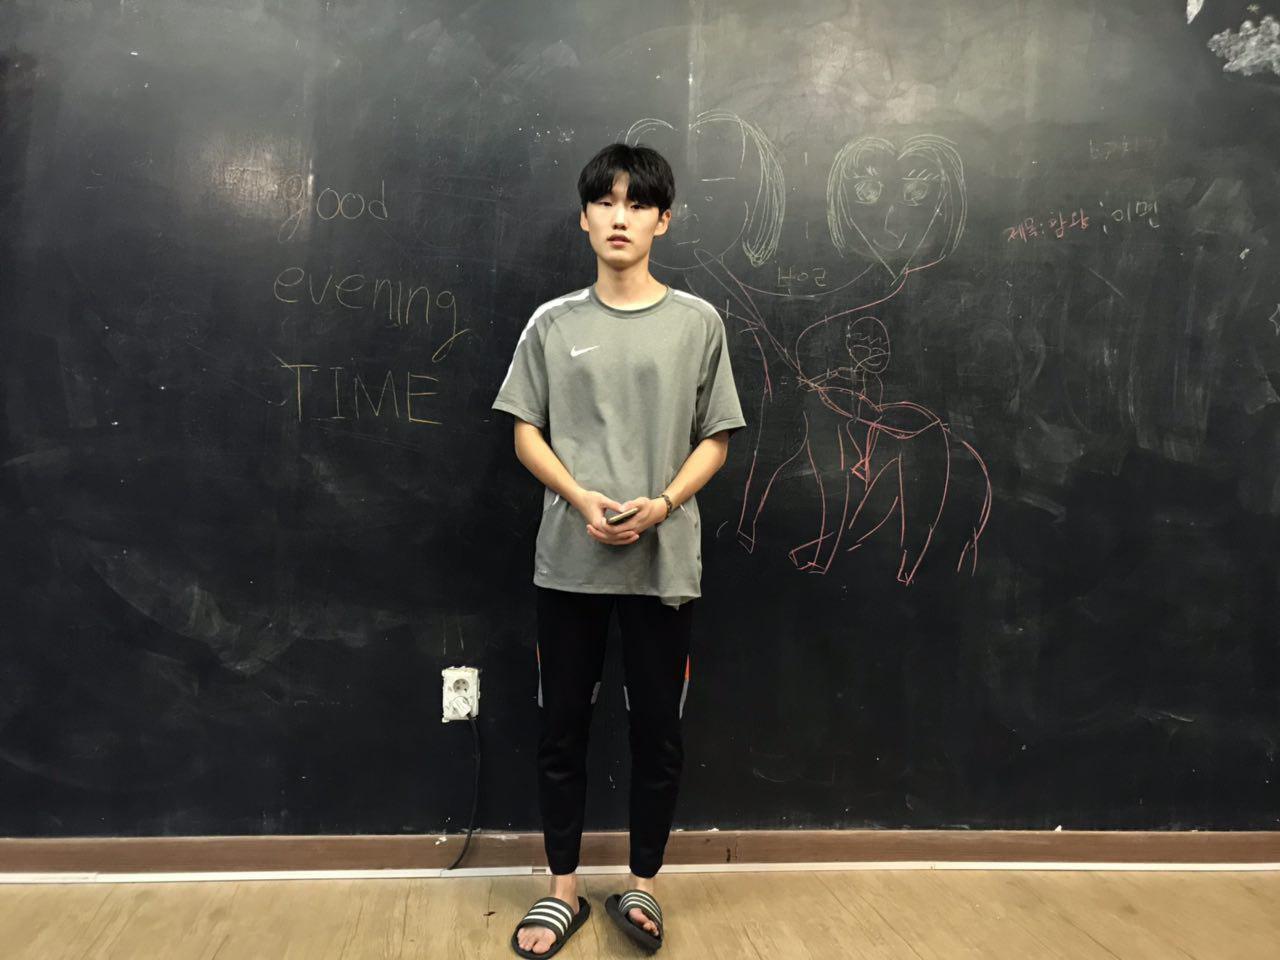 photo_2018-09-19_17-43-38.jpg